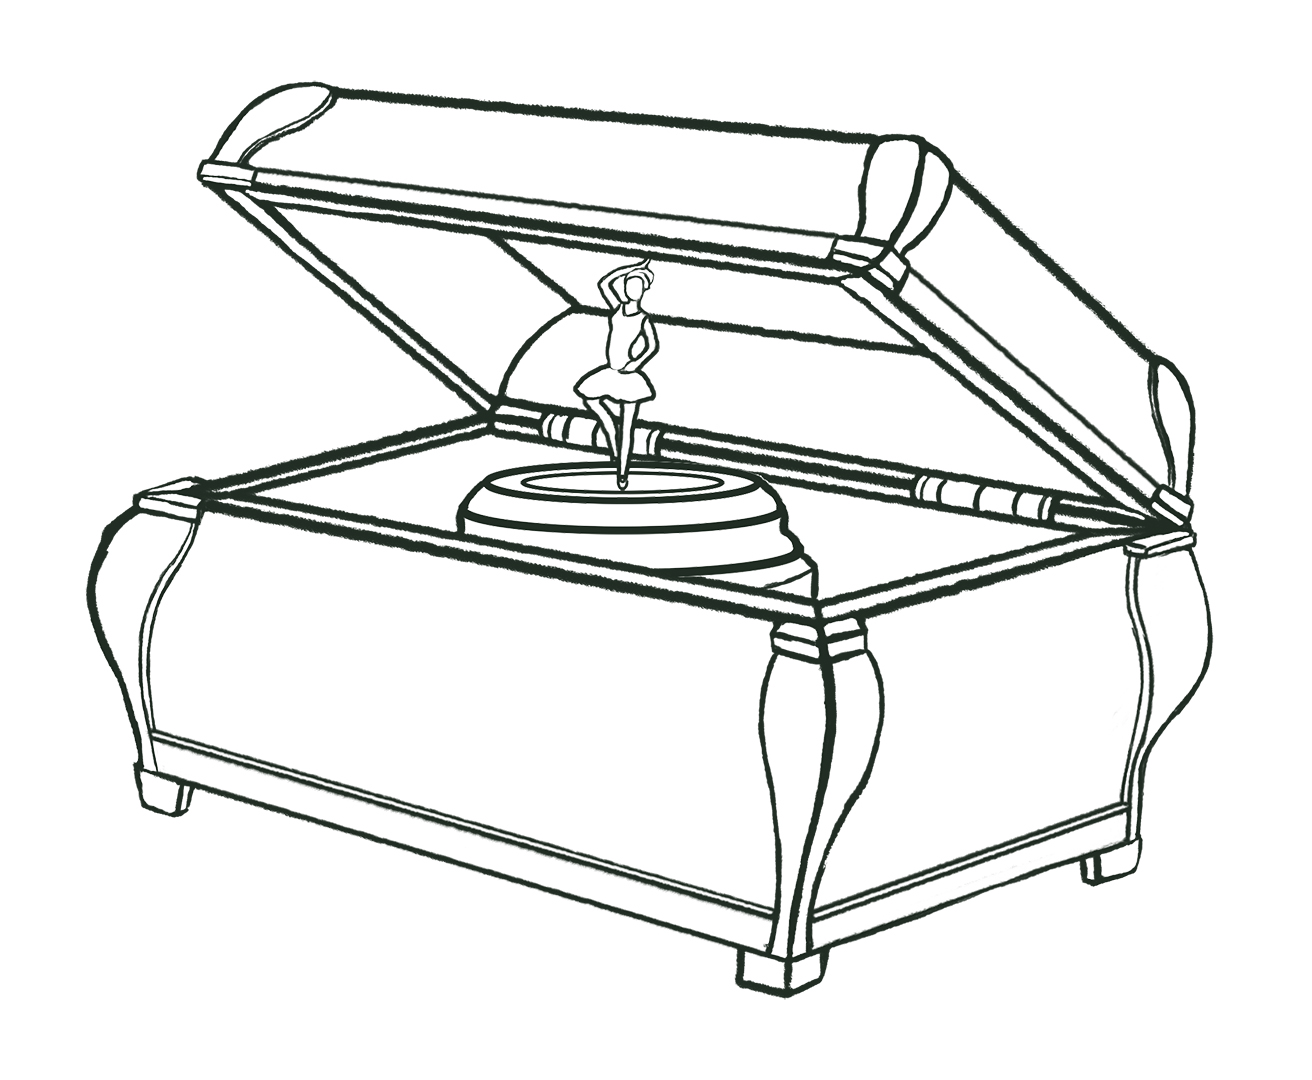 gabriel forbes projet olivia concepts de bo tes musique. Black Bedroom Furniture Sets. Home Design Ideas